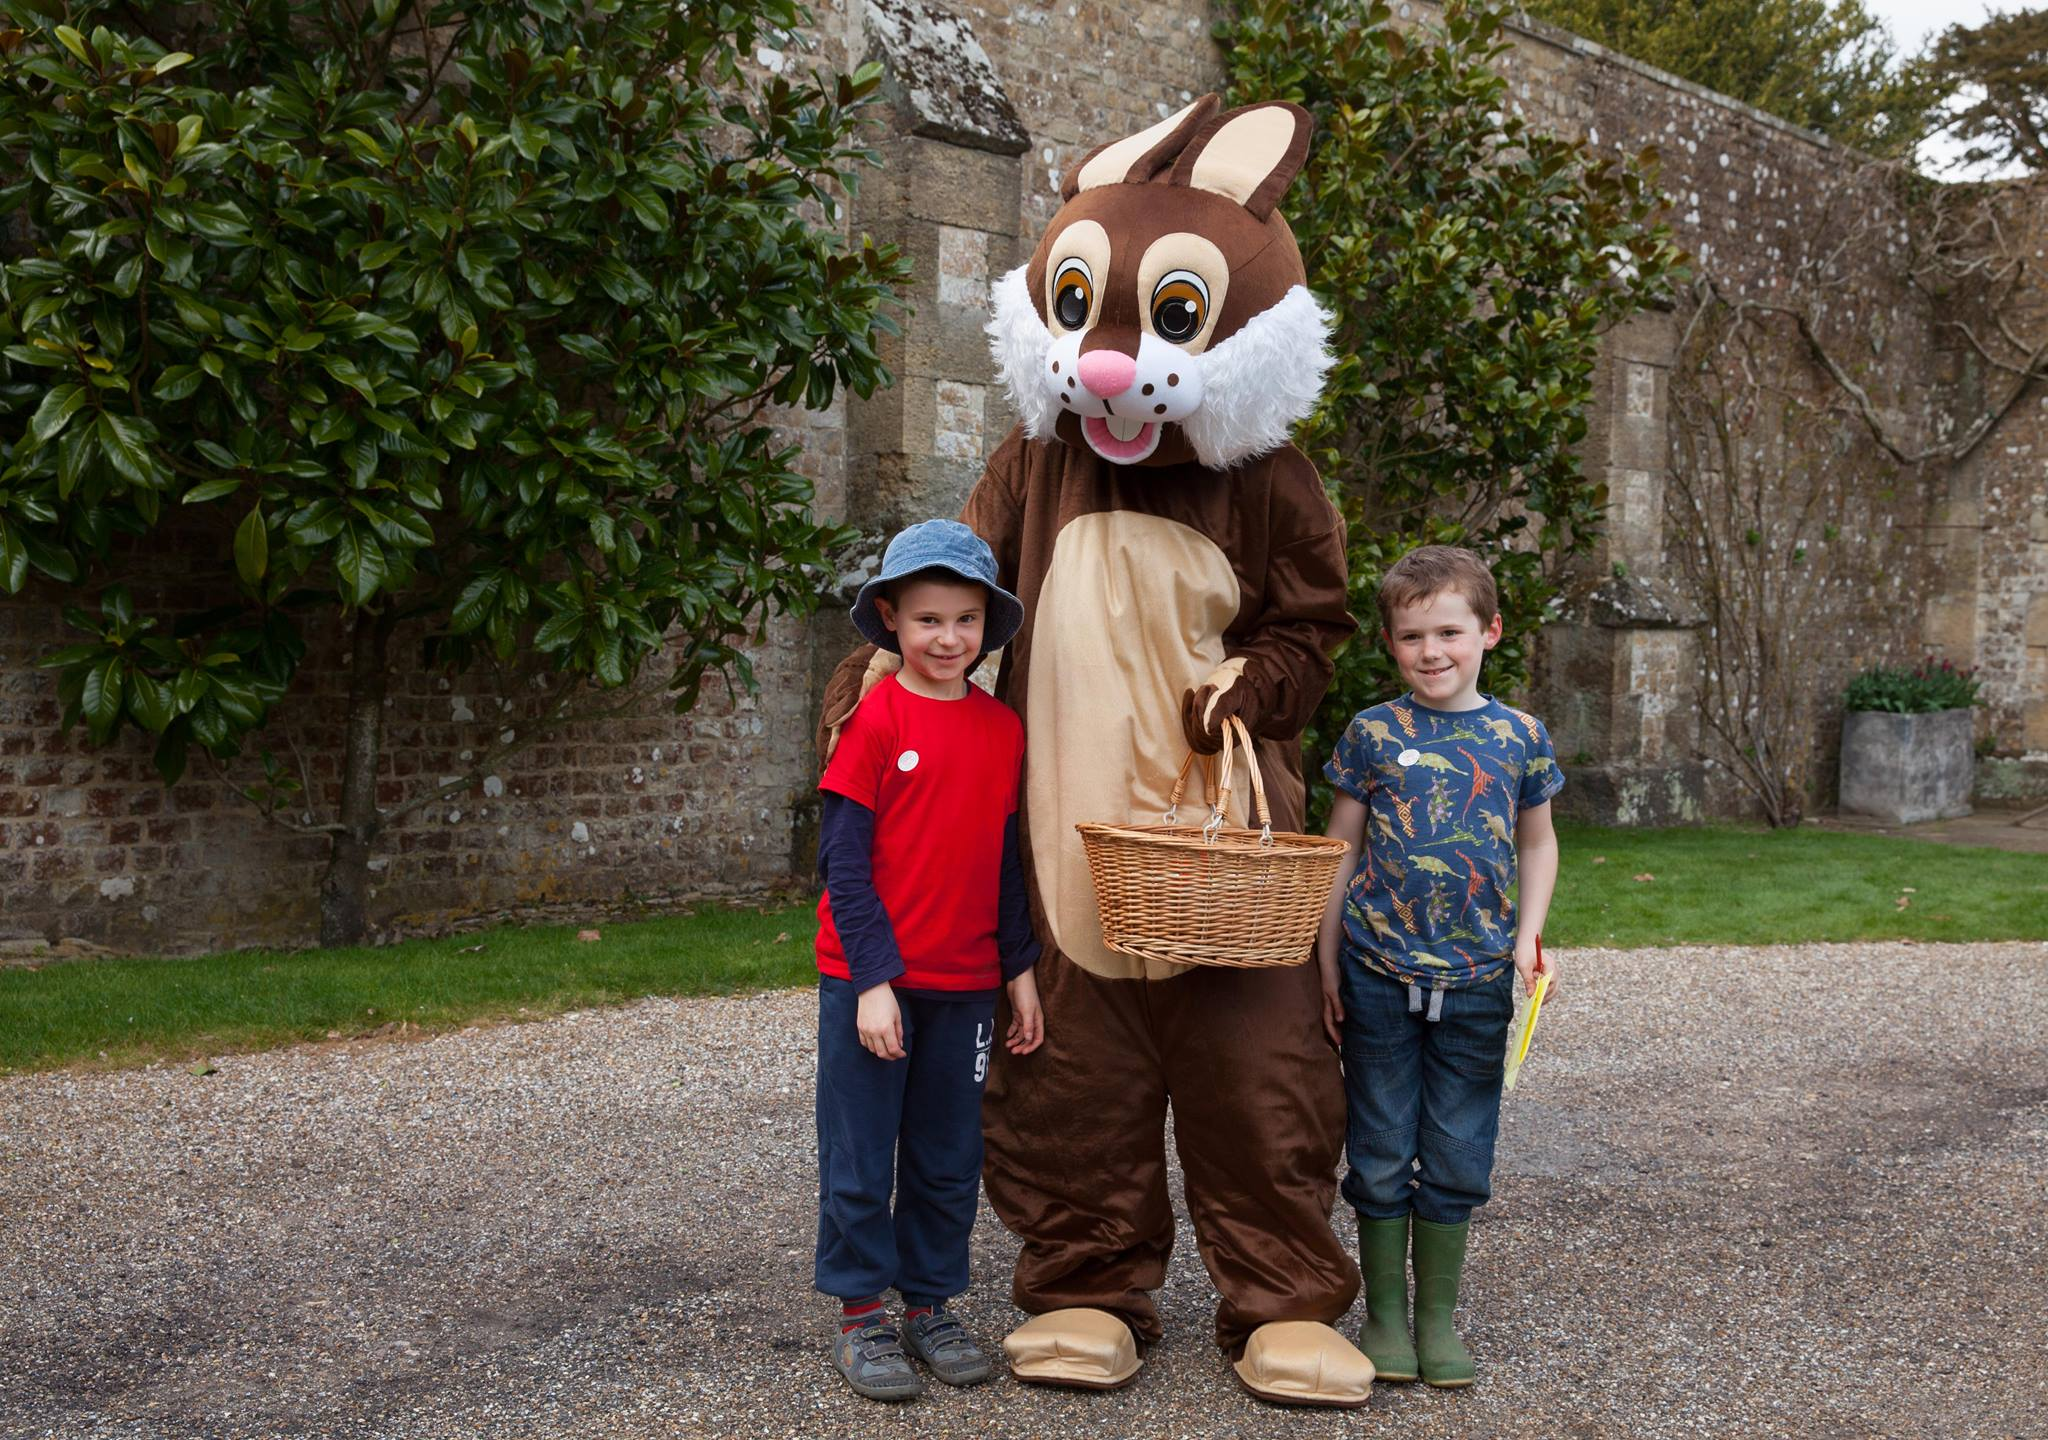 Parham Easter Family Weekend